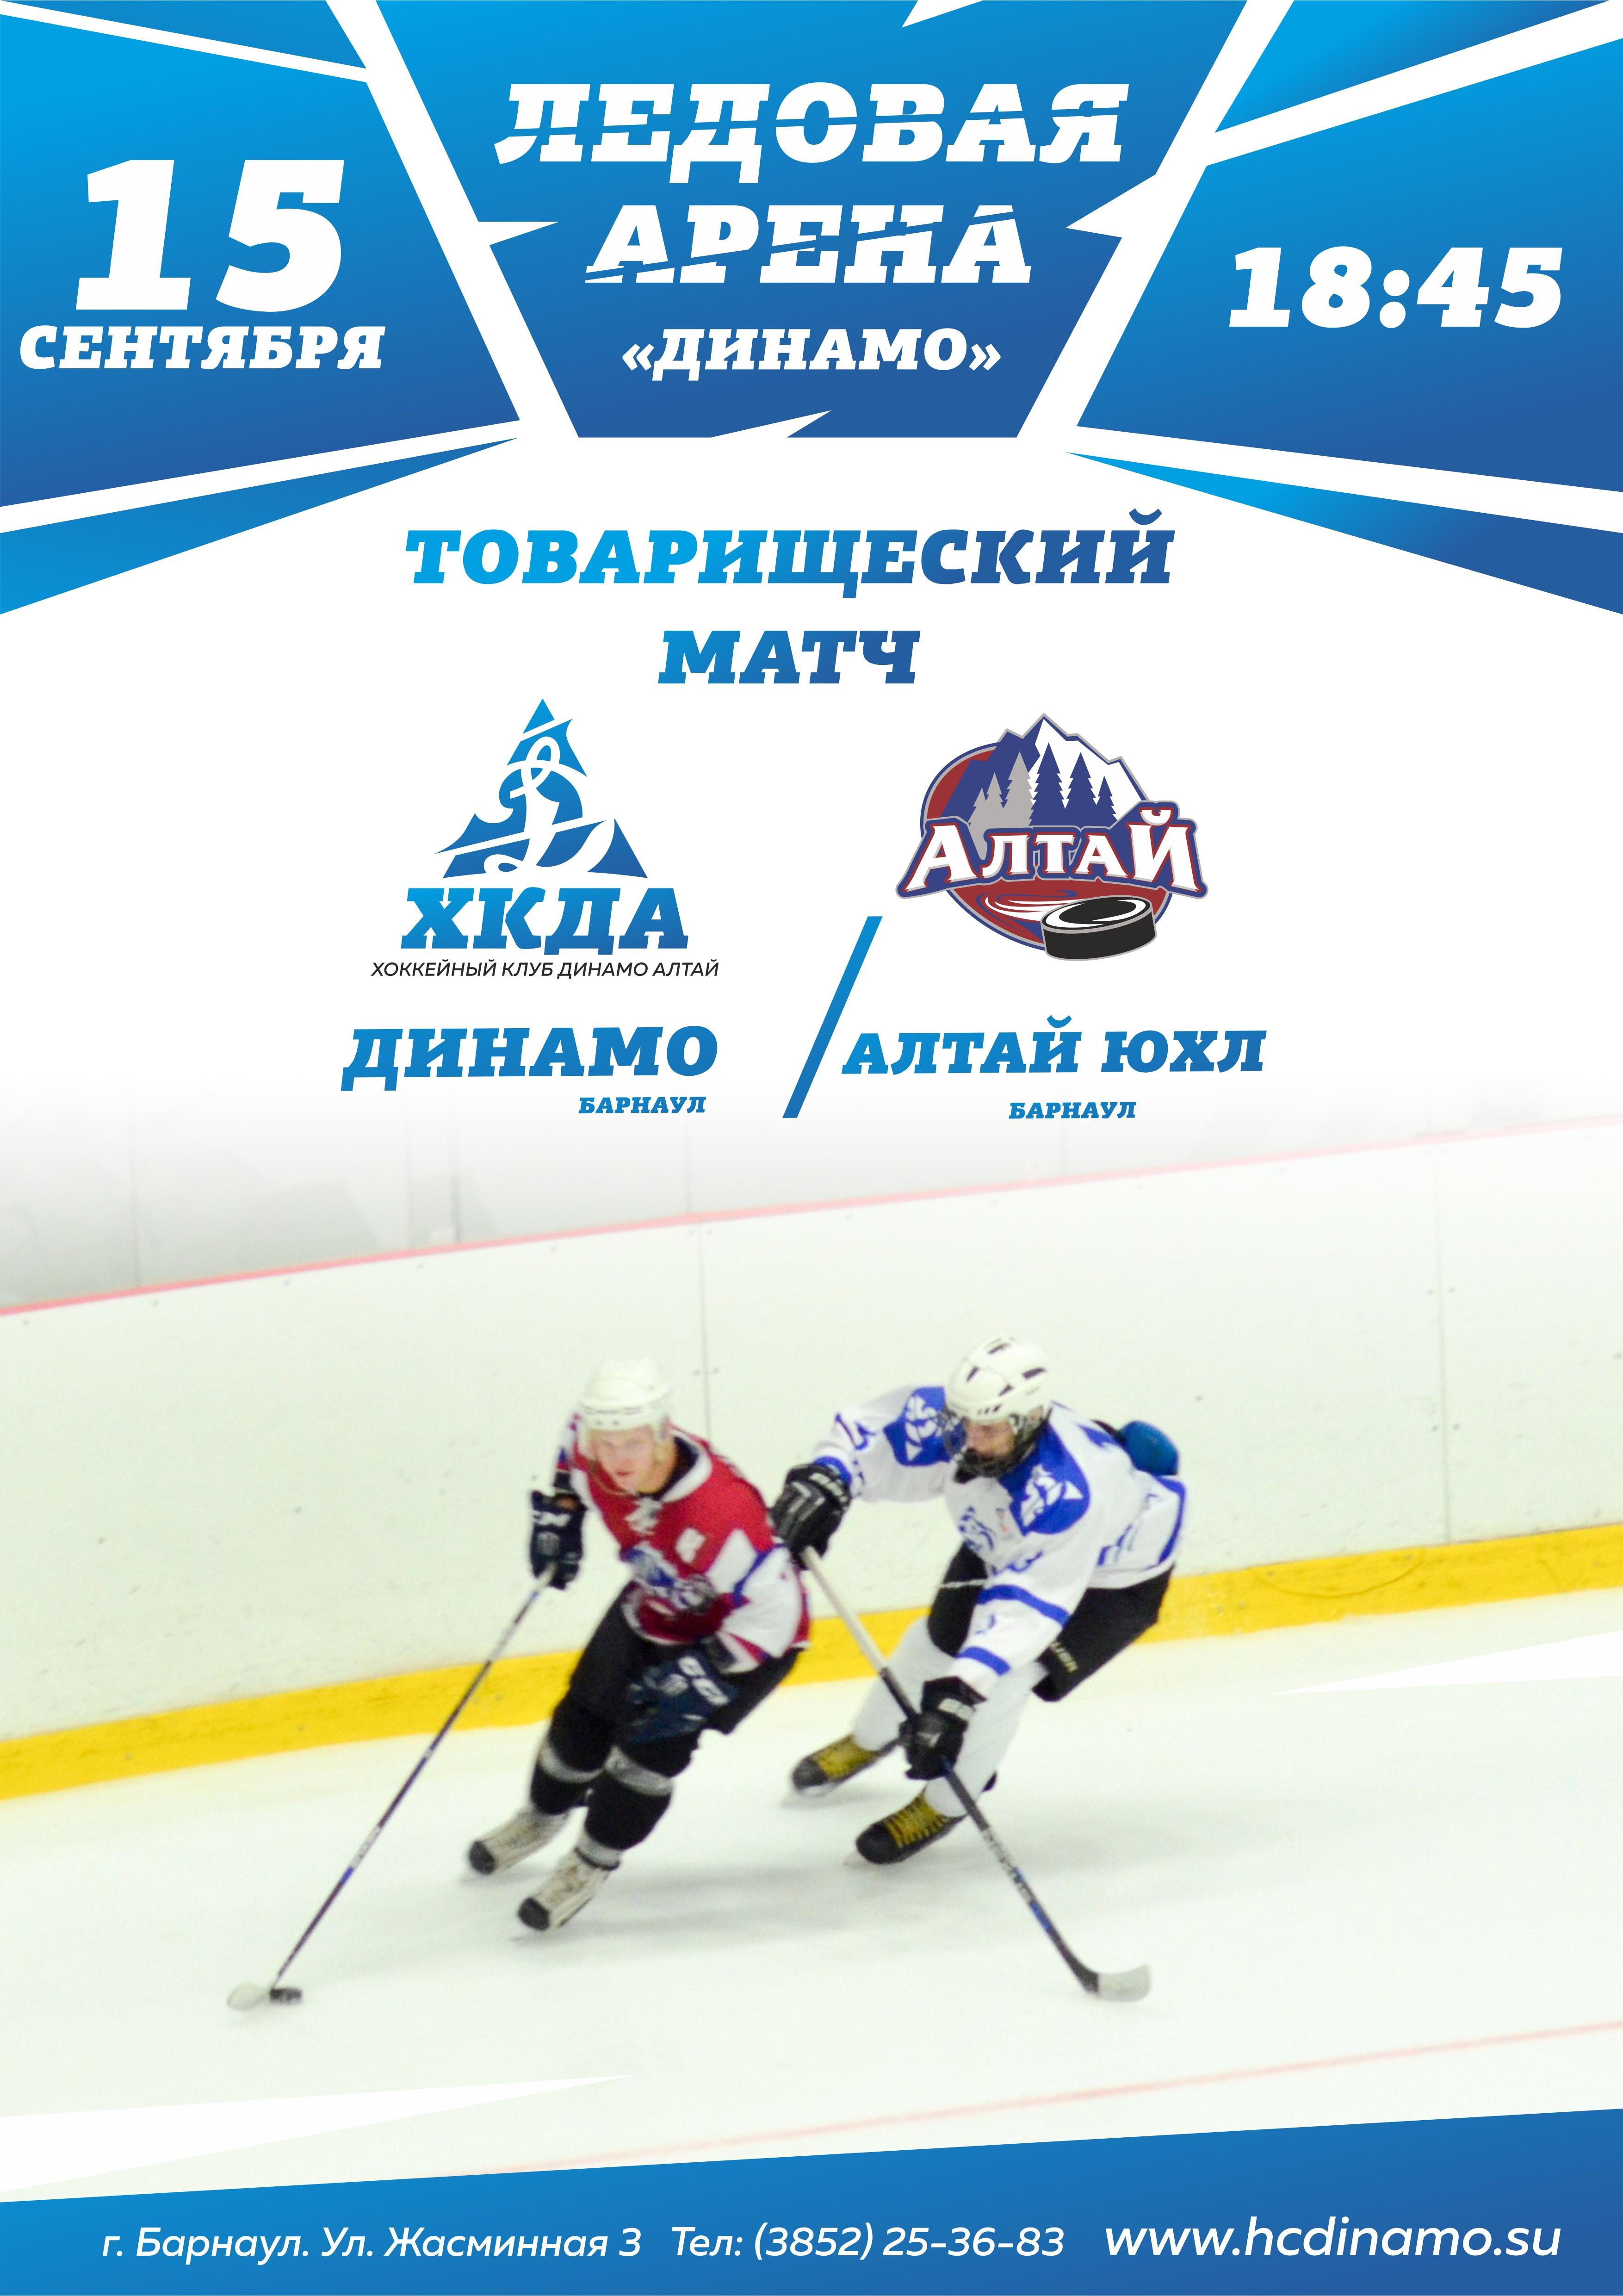 «Динамо-Алтай» /СХЛ (Тренер: А. Усачев) - «Алтай» /ЮХЛ (Тренер: Д. Горенко)